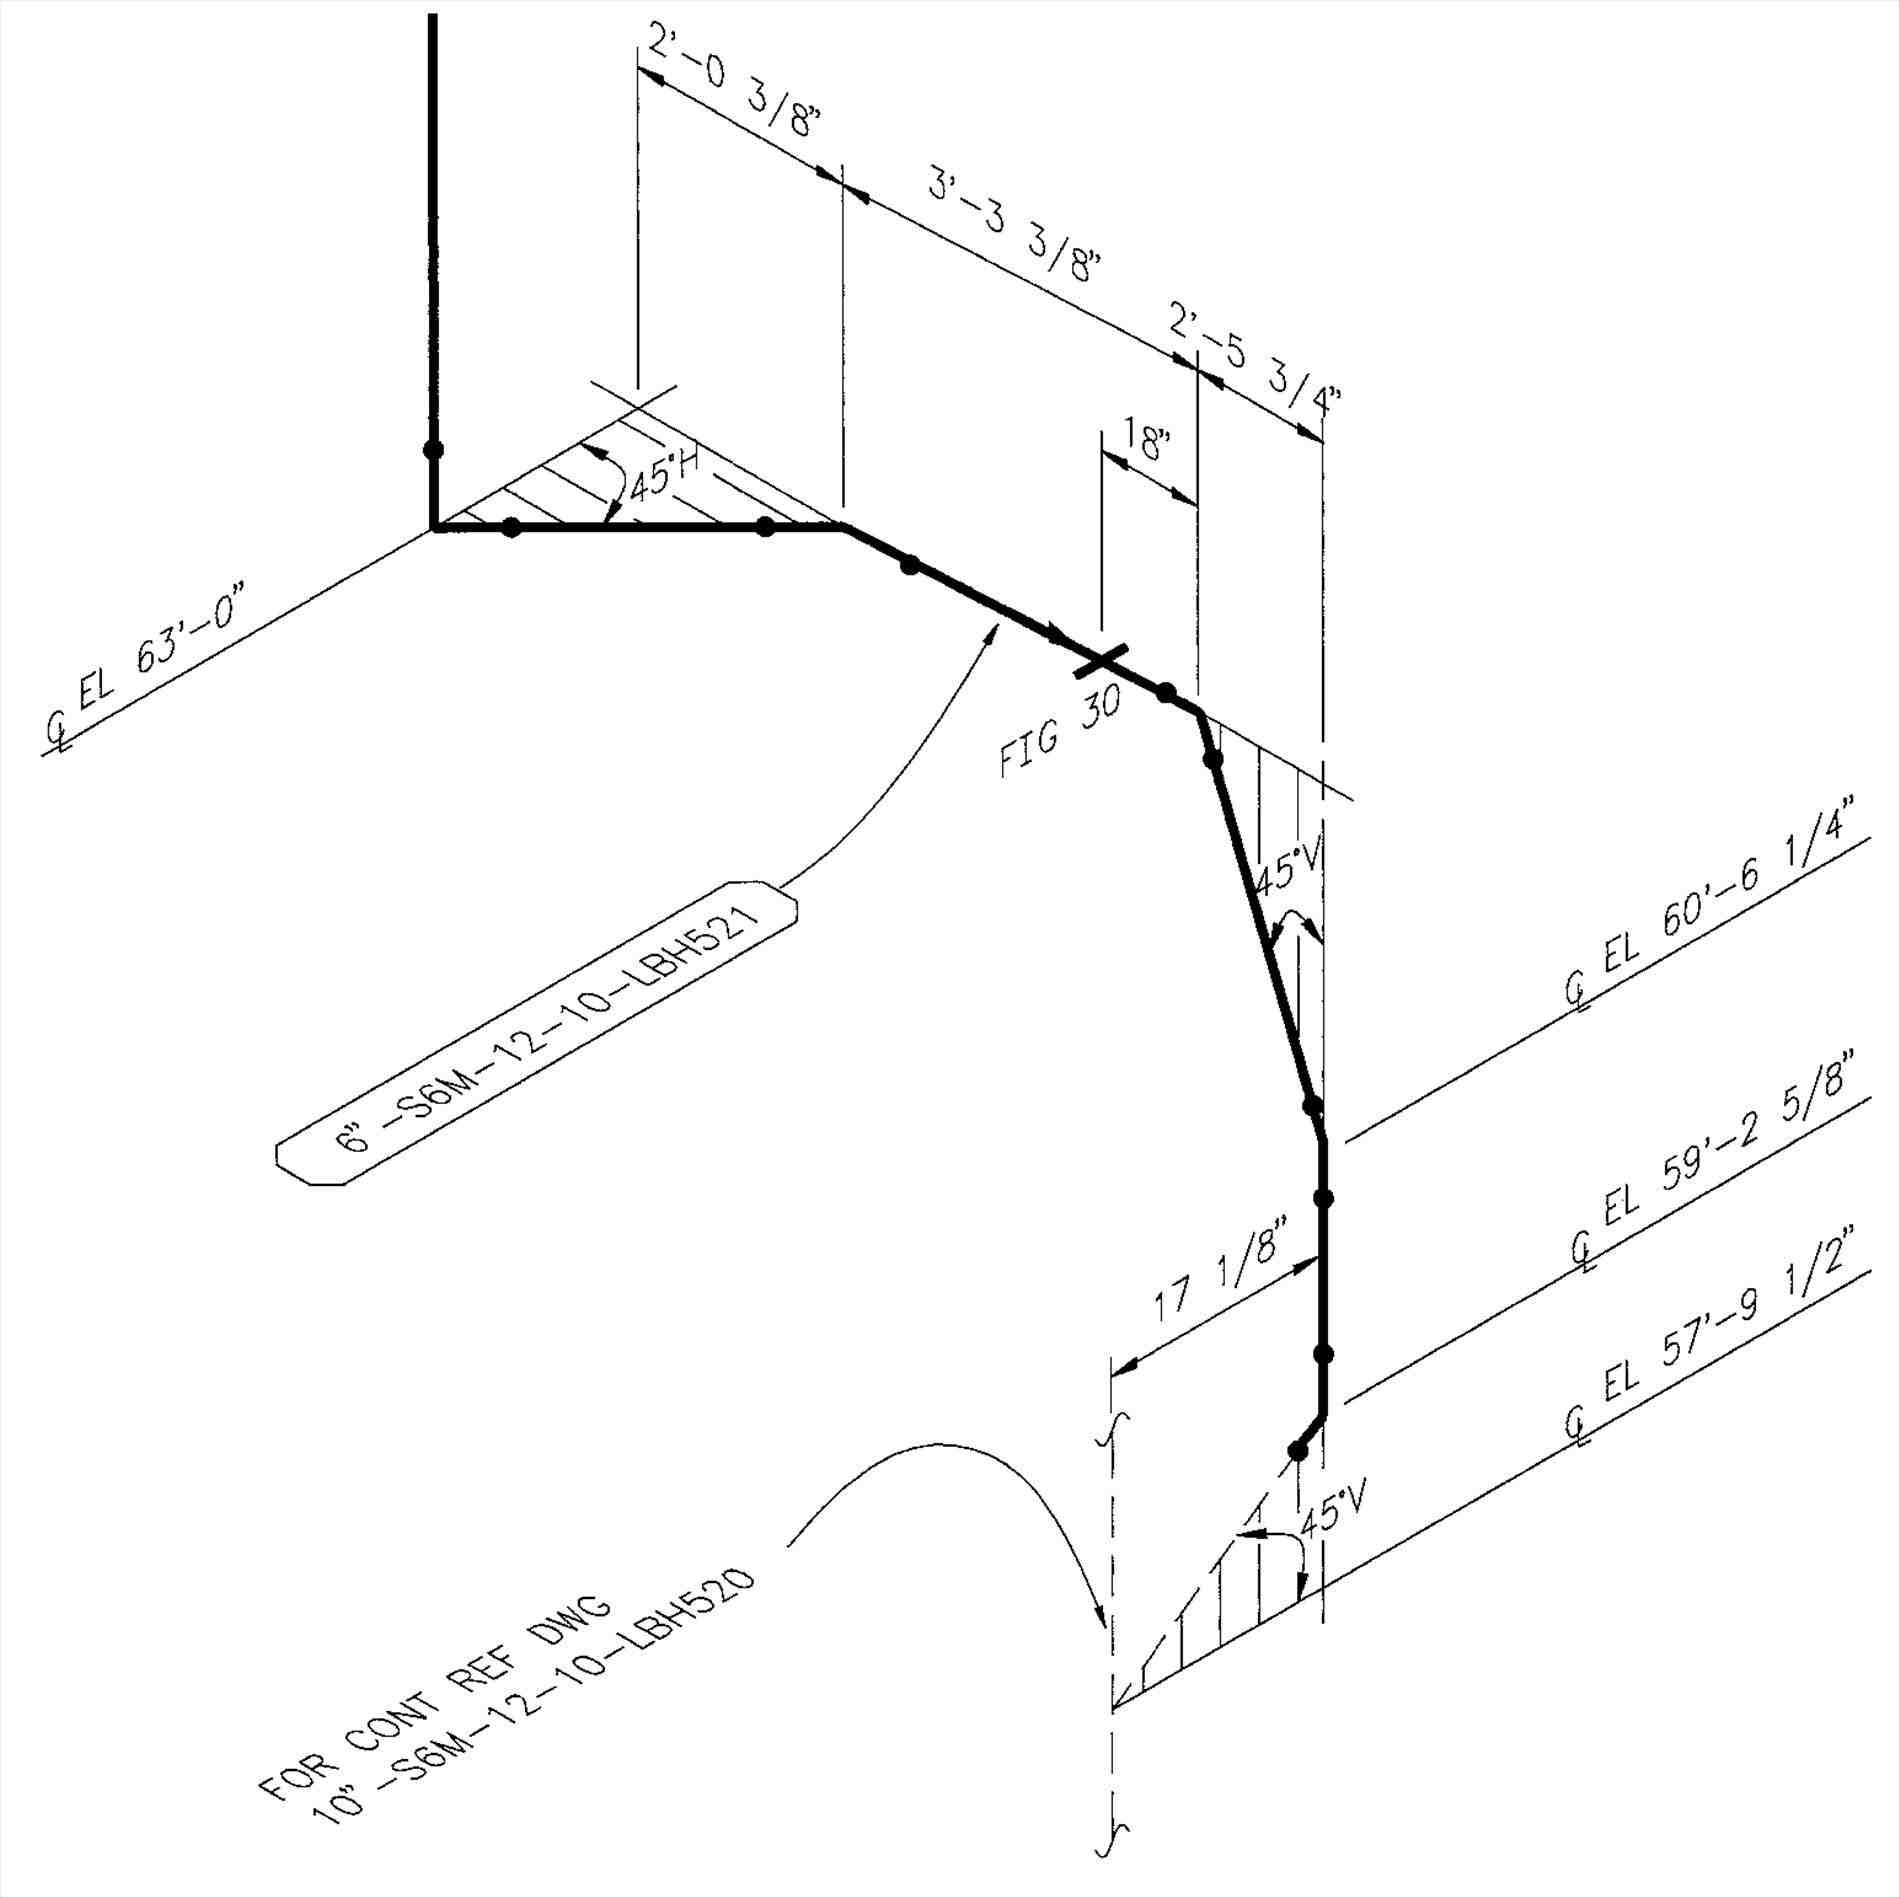 isometric piping diagram venn formula for 2 sets pipe drawing at getdrawings free